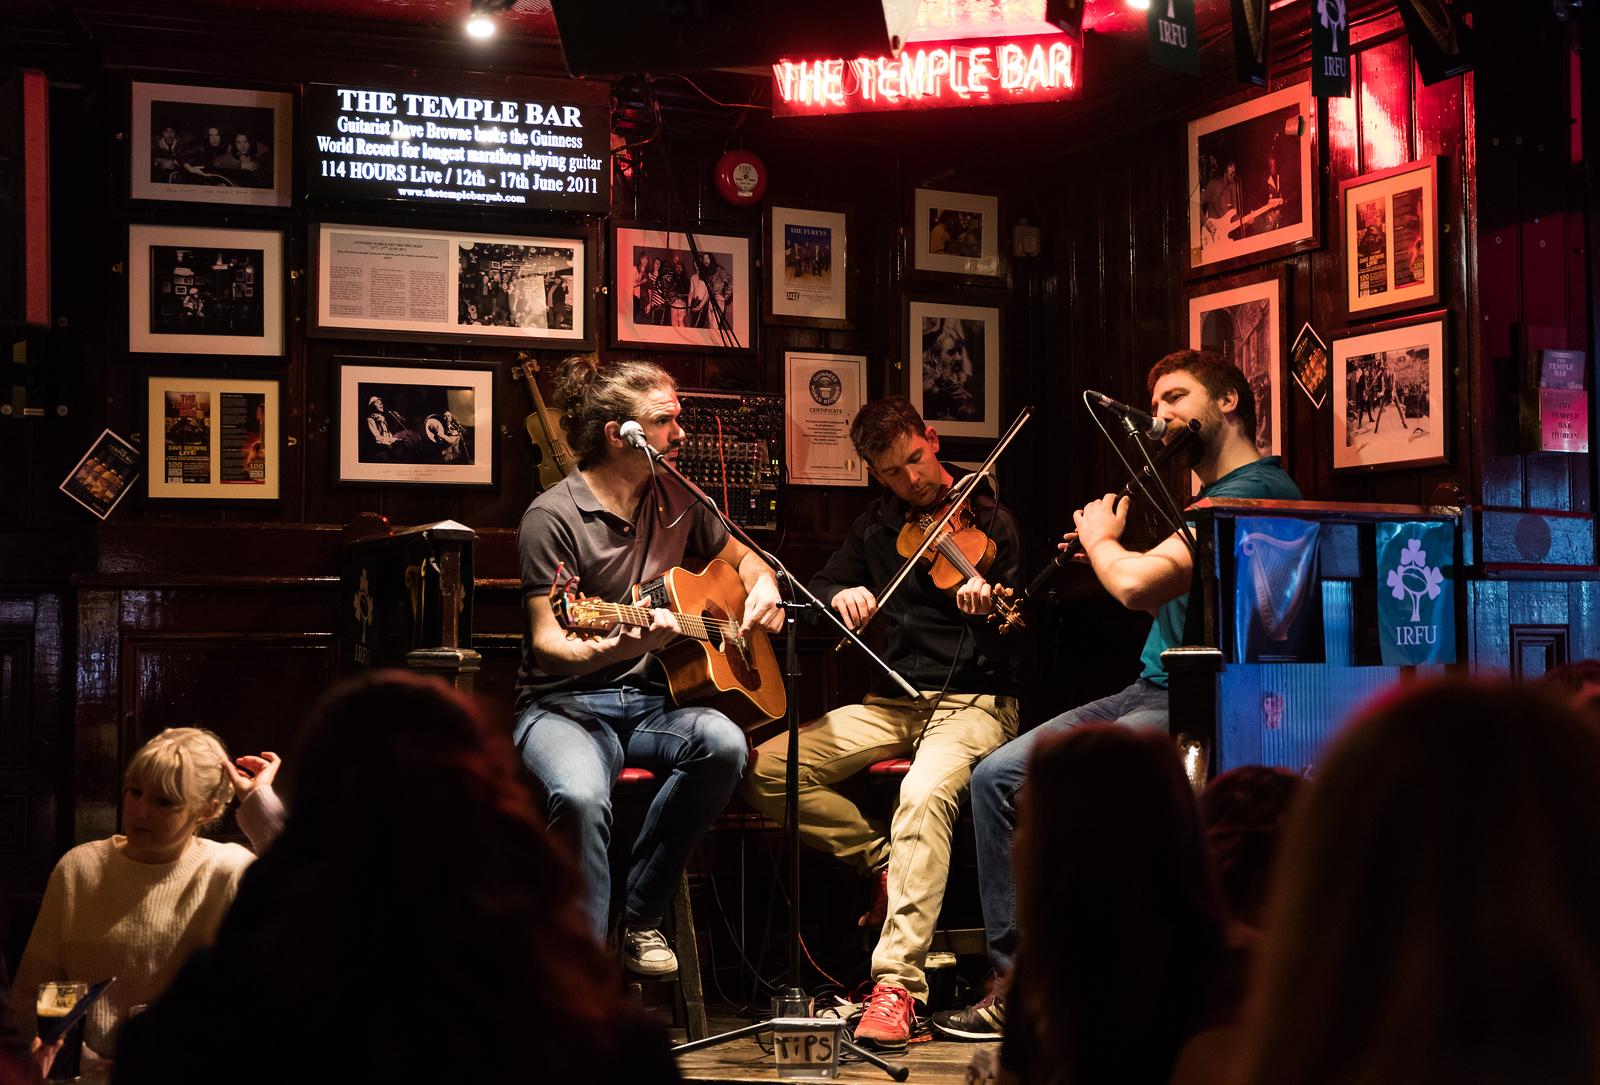 Live music @ Temple Bar, Dublin